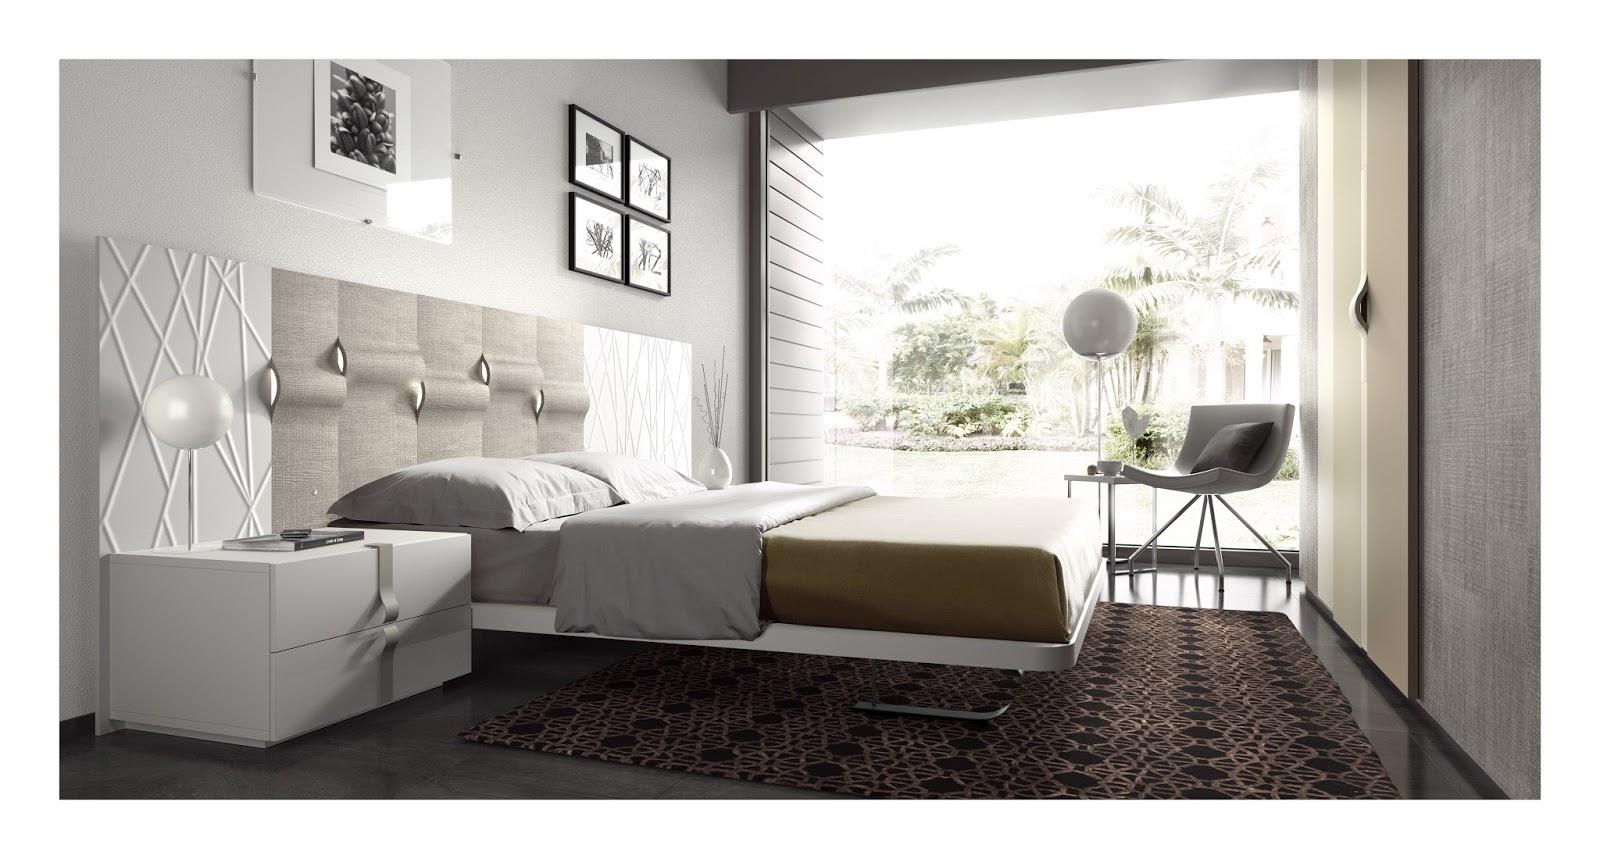 chapa tortuga oak laca blanca shangai with dormitorios de matrimonio modernos baratos